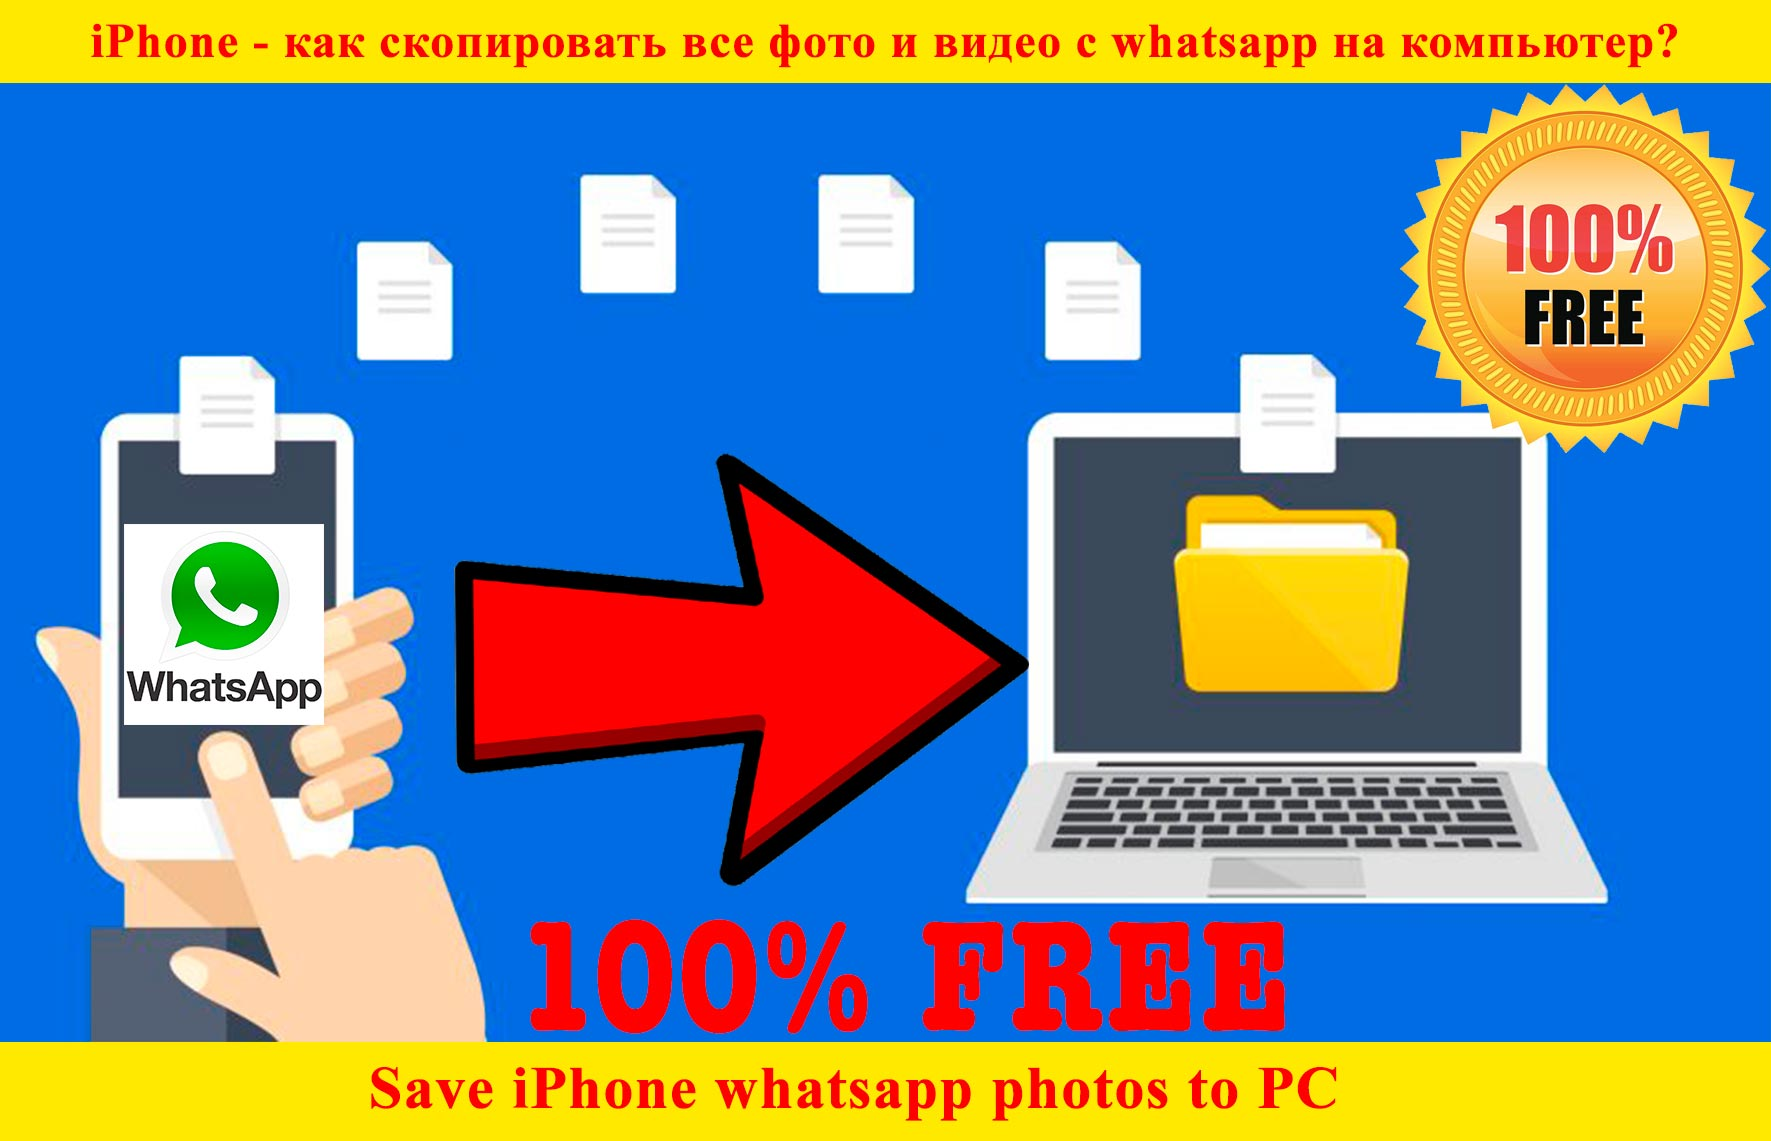 как скопировать из whatsapp все фото и видео с iphone на компьютер